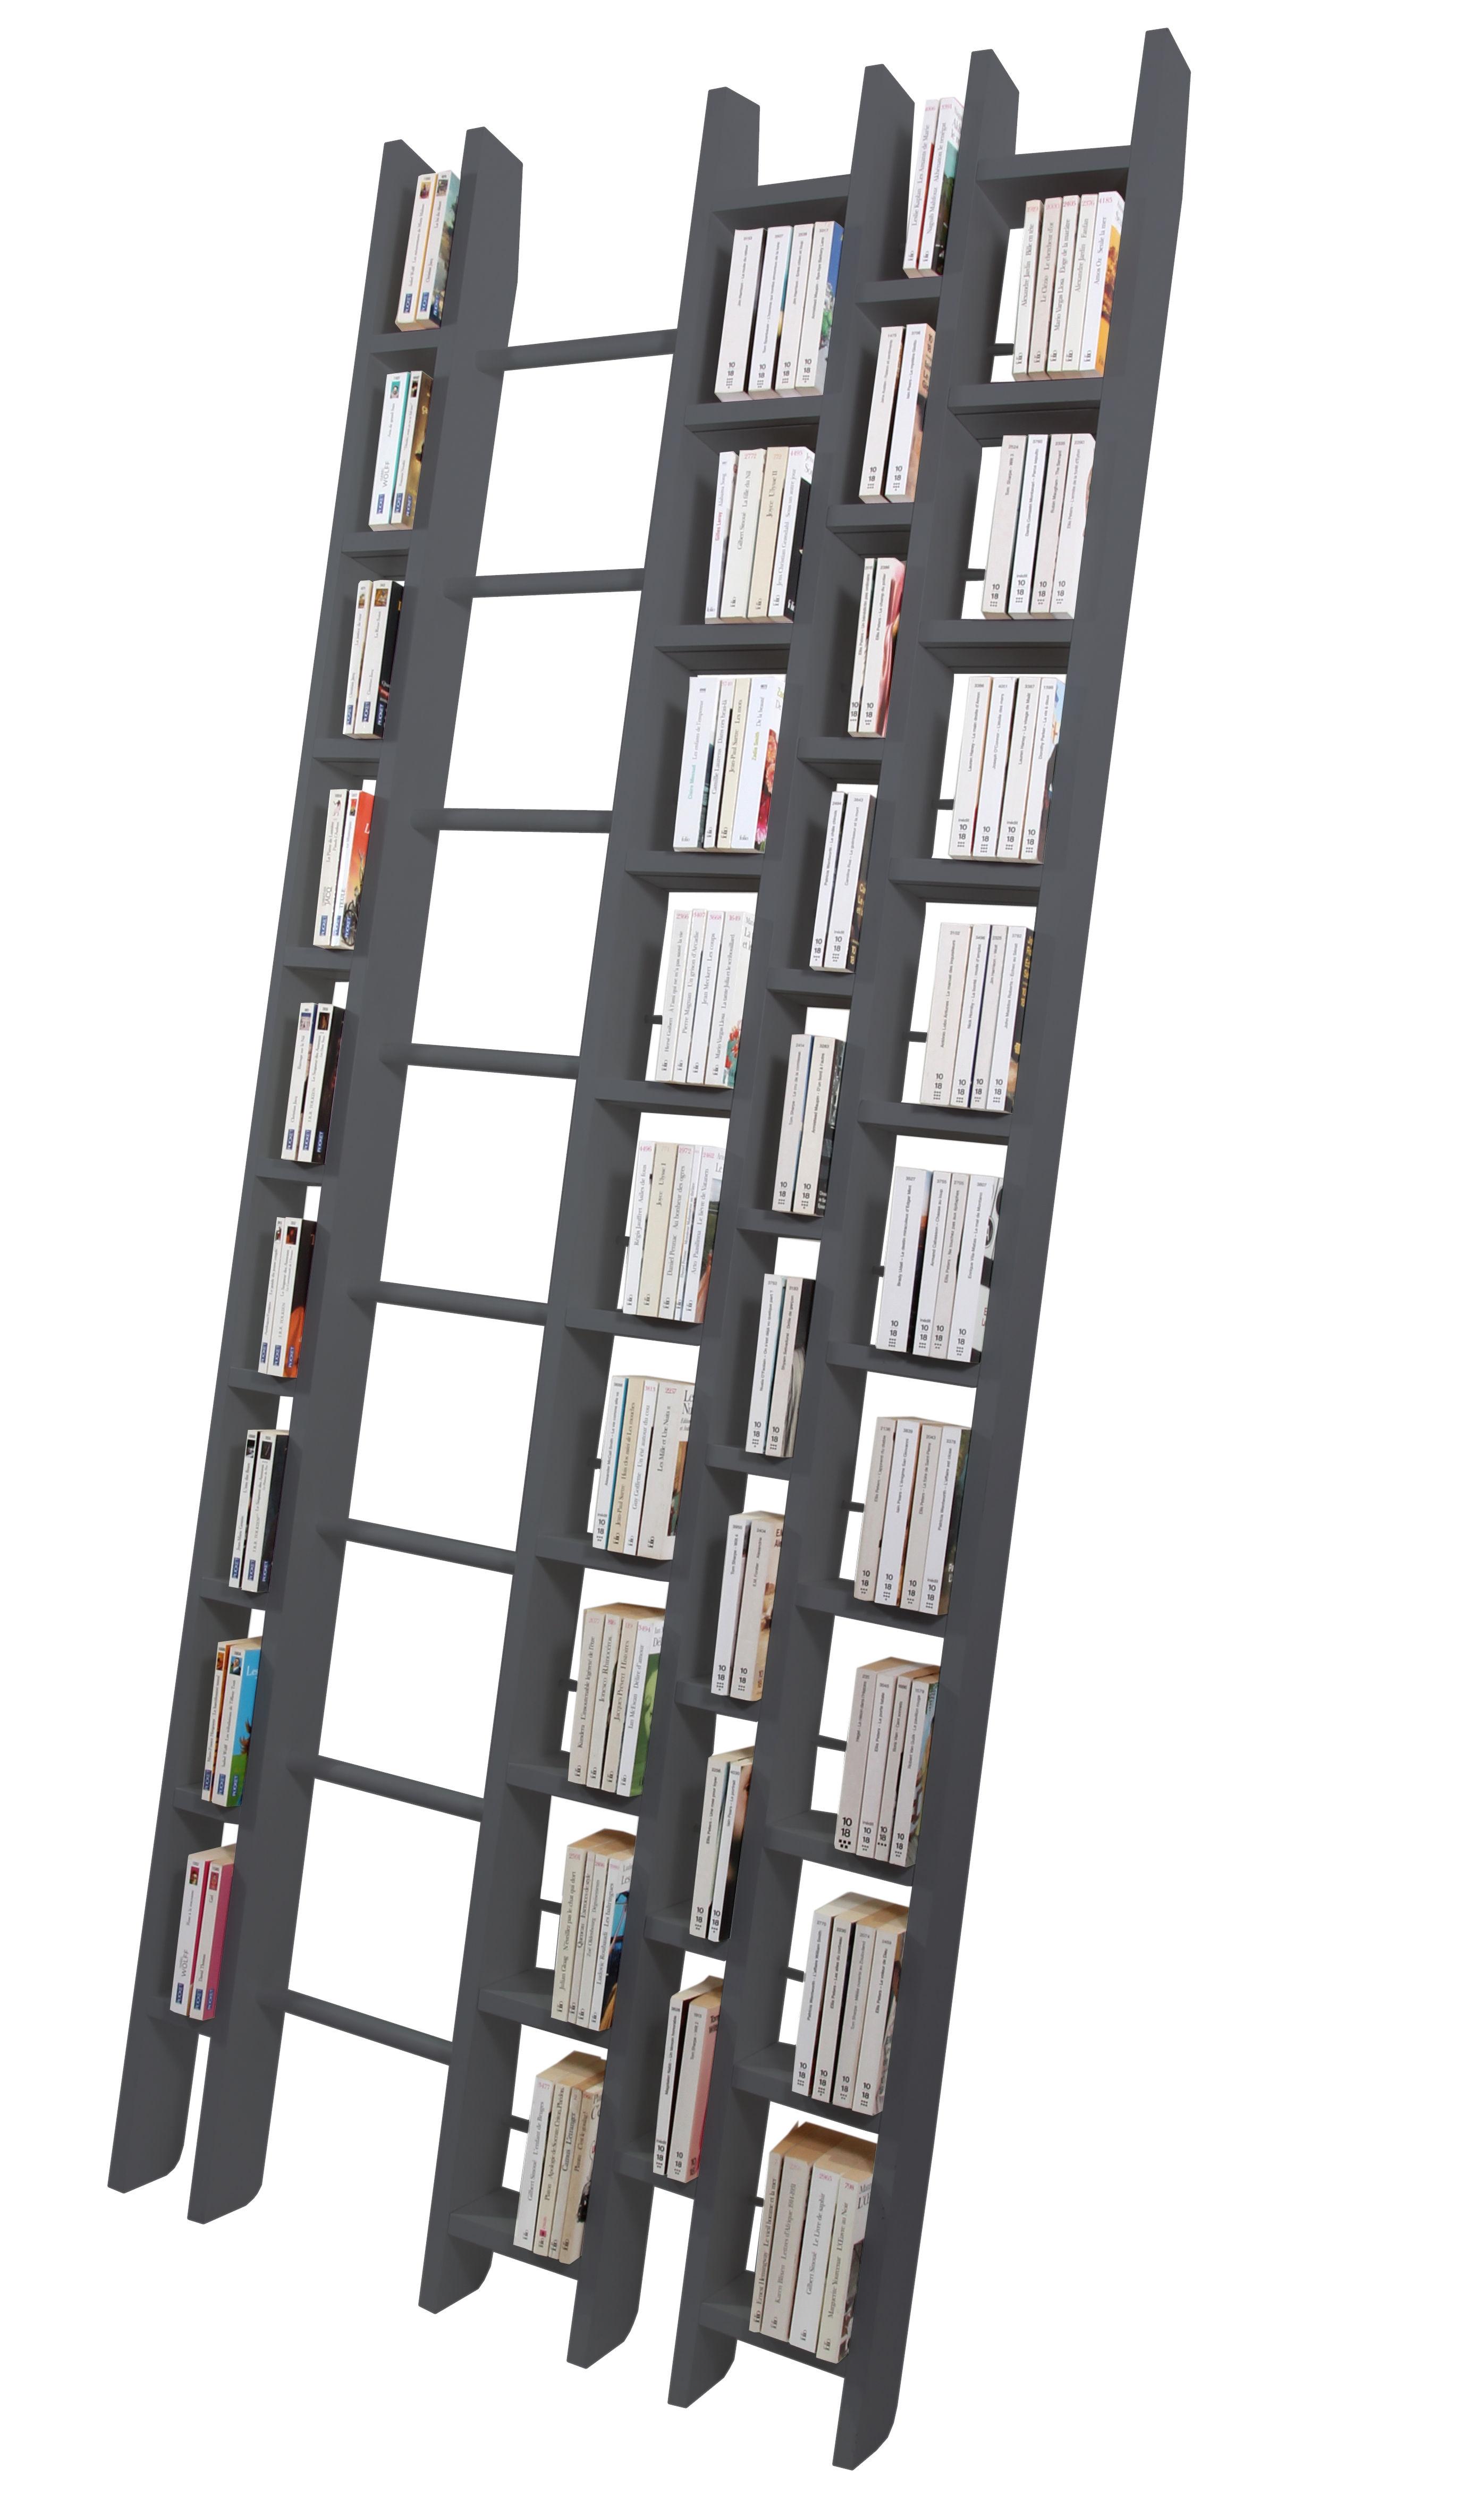 Möbel - Regale und Bücherregale - Hô + Bücherregal B 96 cm - Exklusivmodell - La Corbeille - grau - Hêtre massif laqué